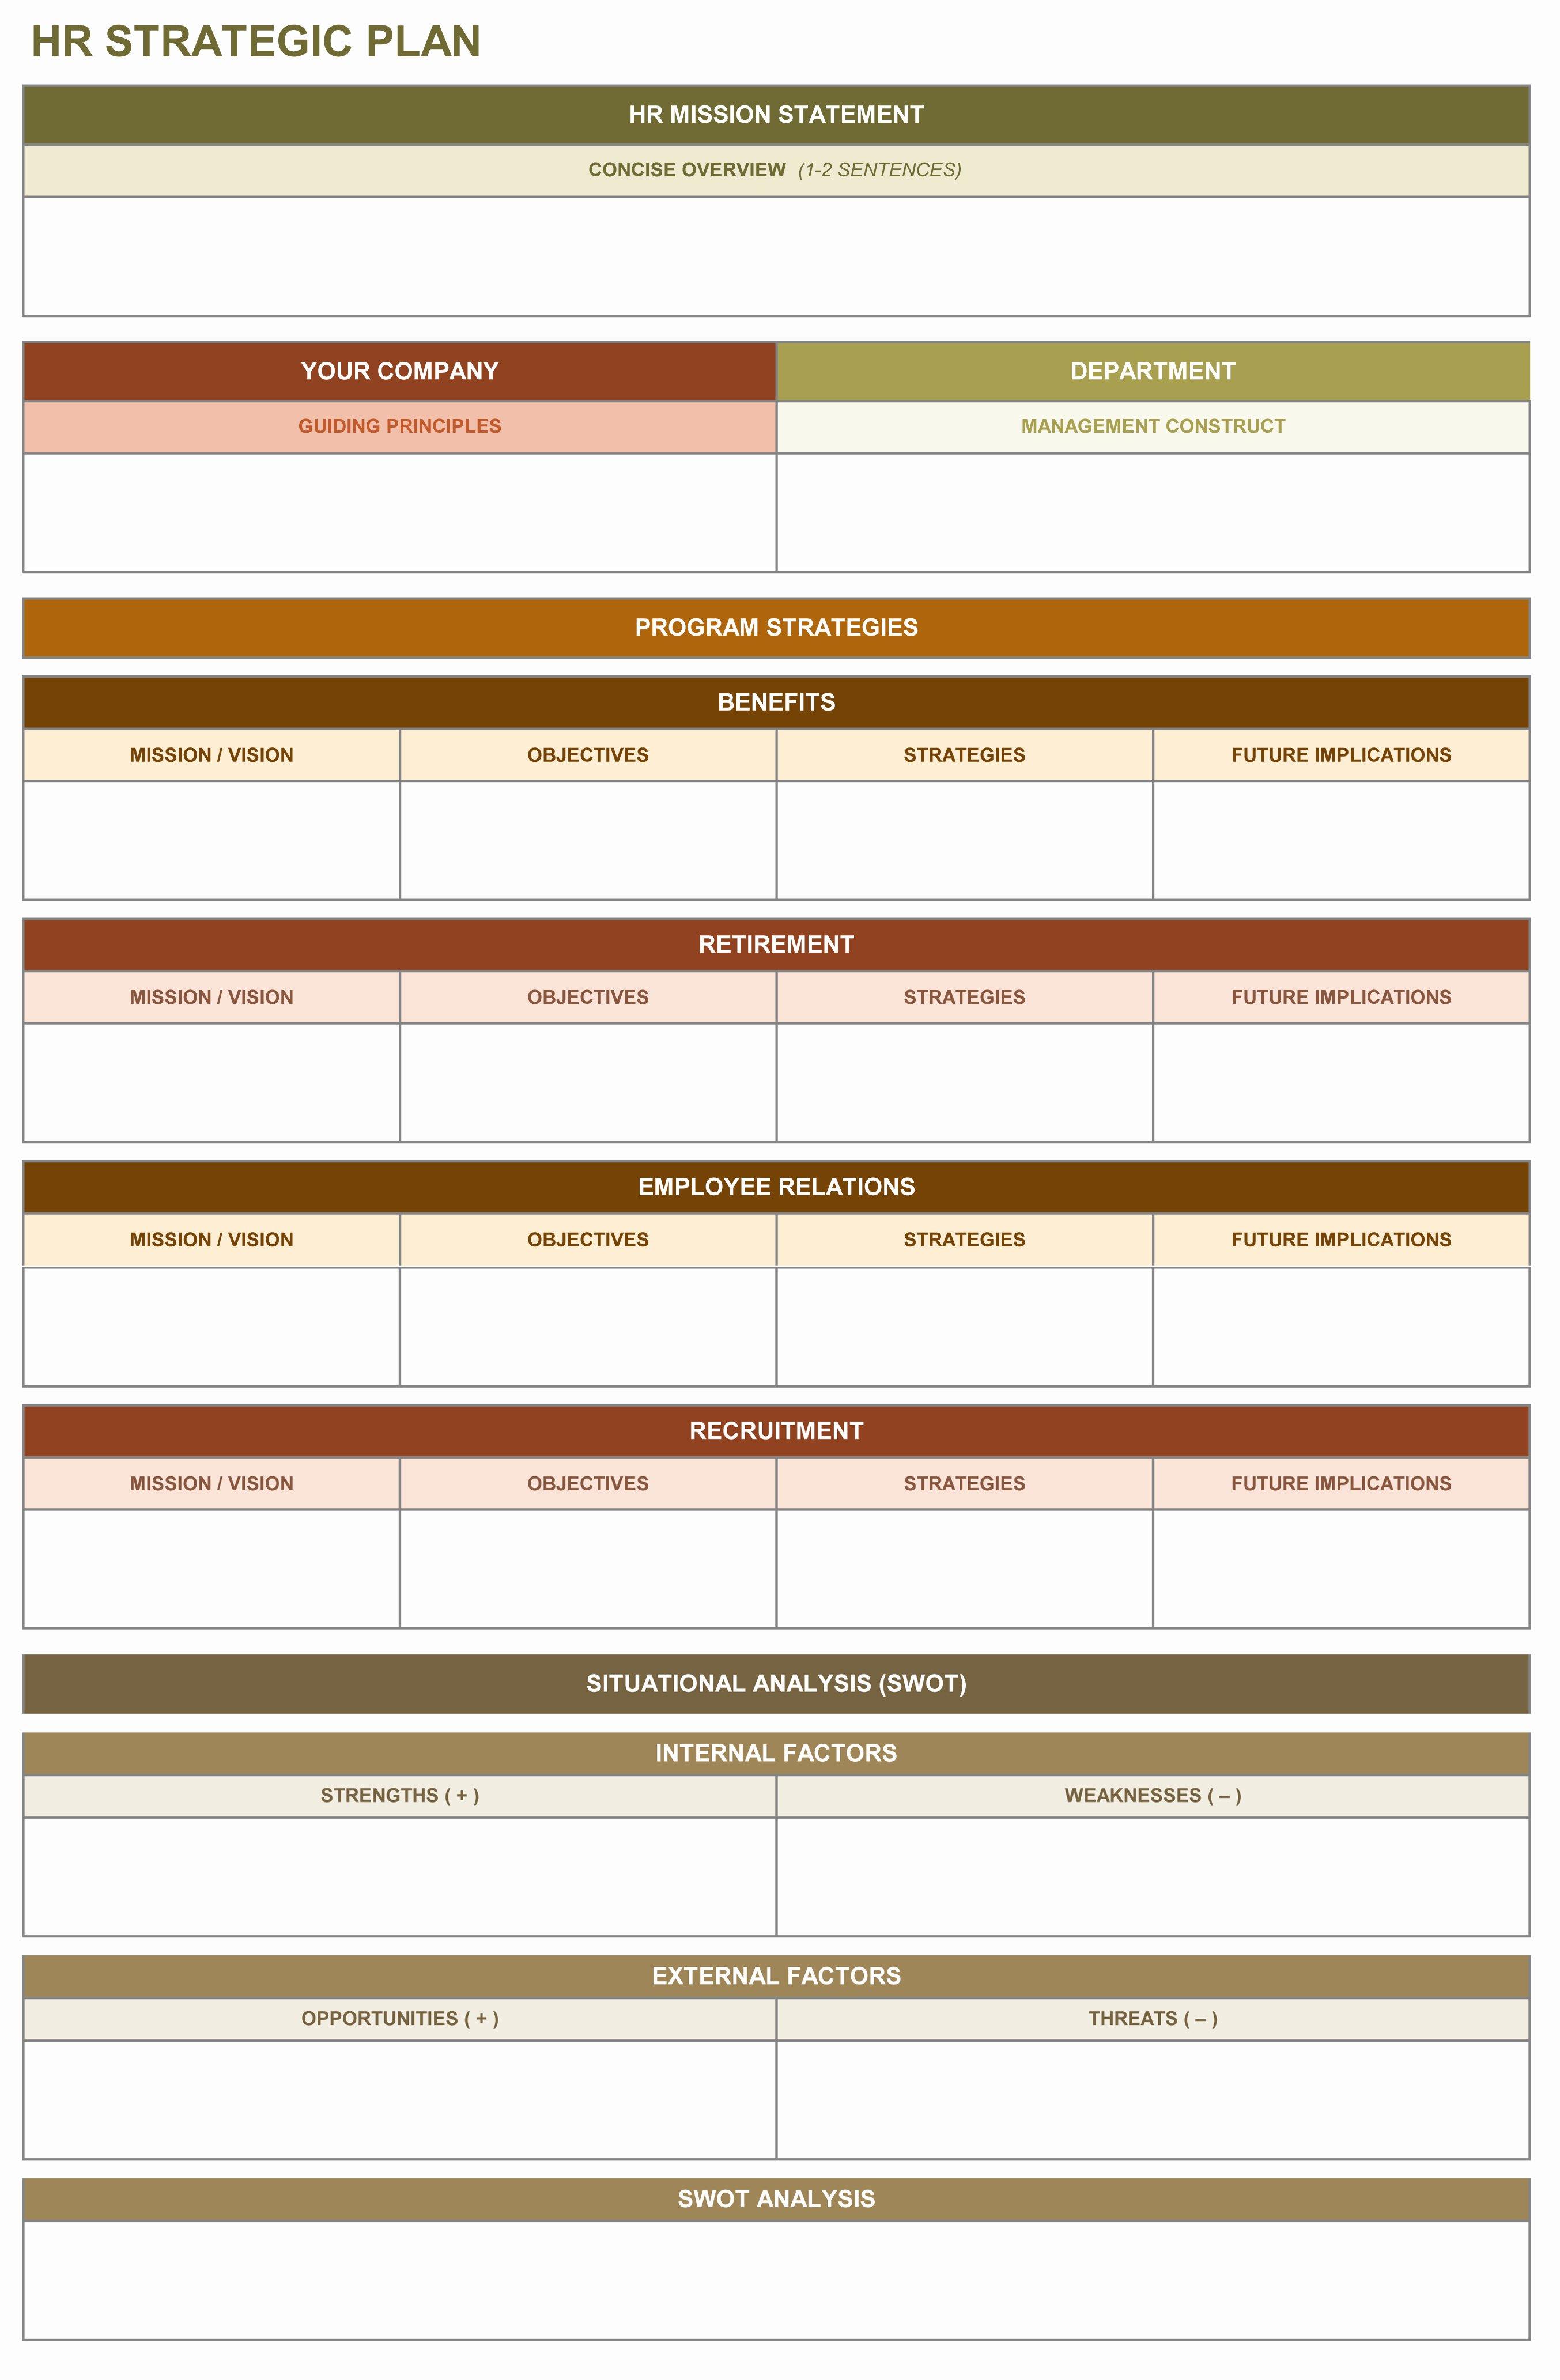 Strategic Plan Template Excel Awesome 9 Free Strategic Planning Templates Smartsheet